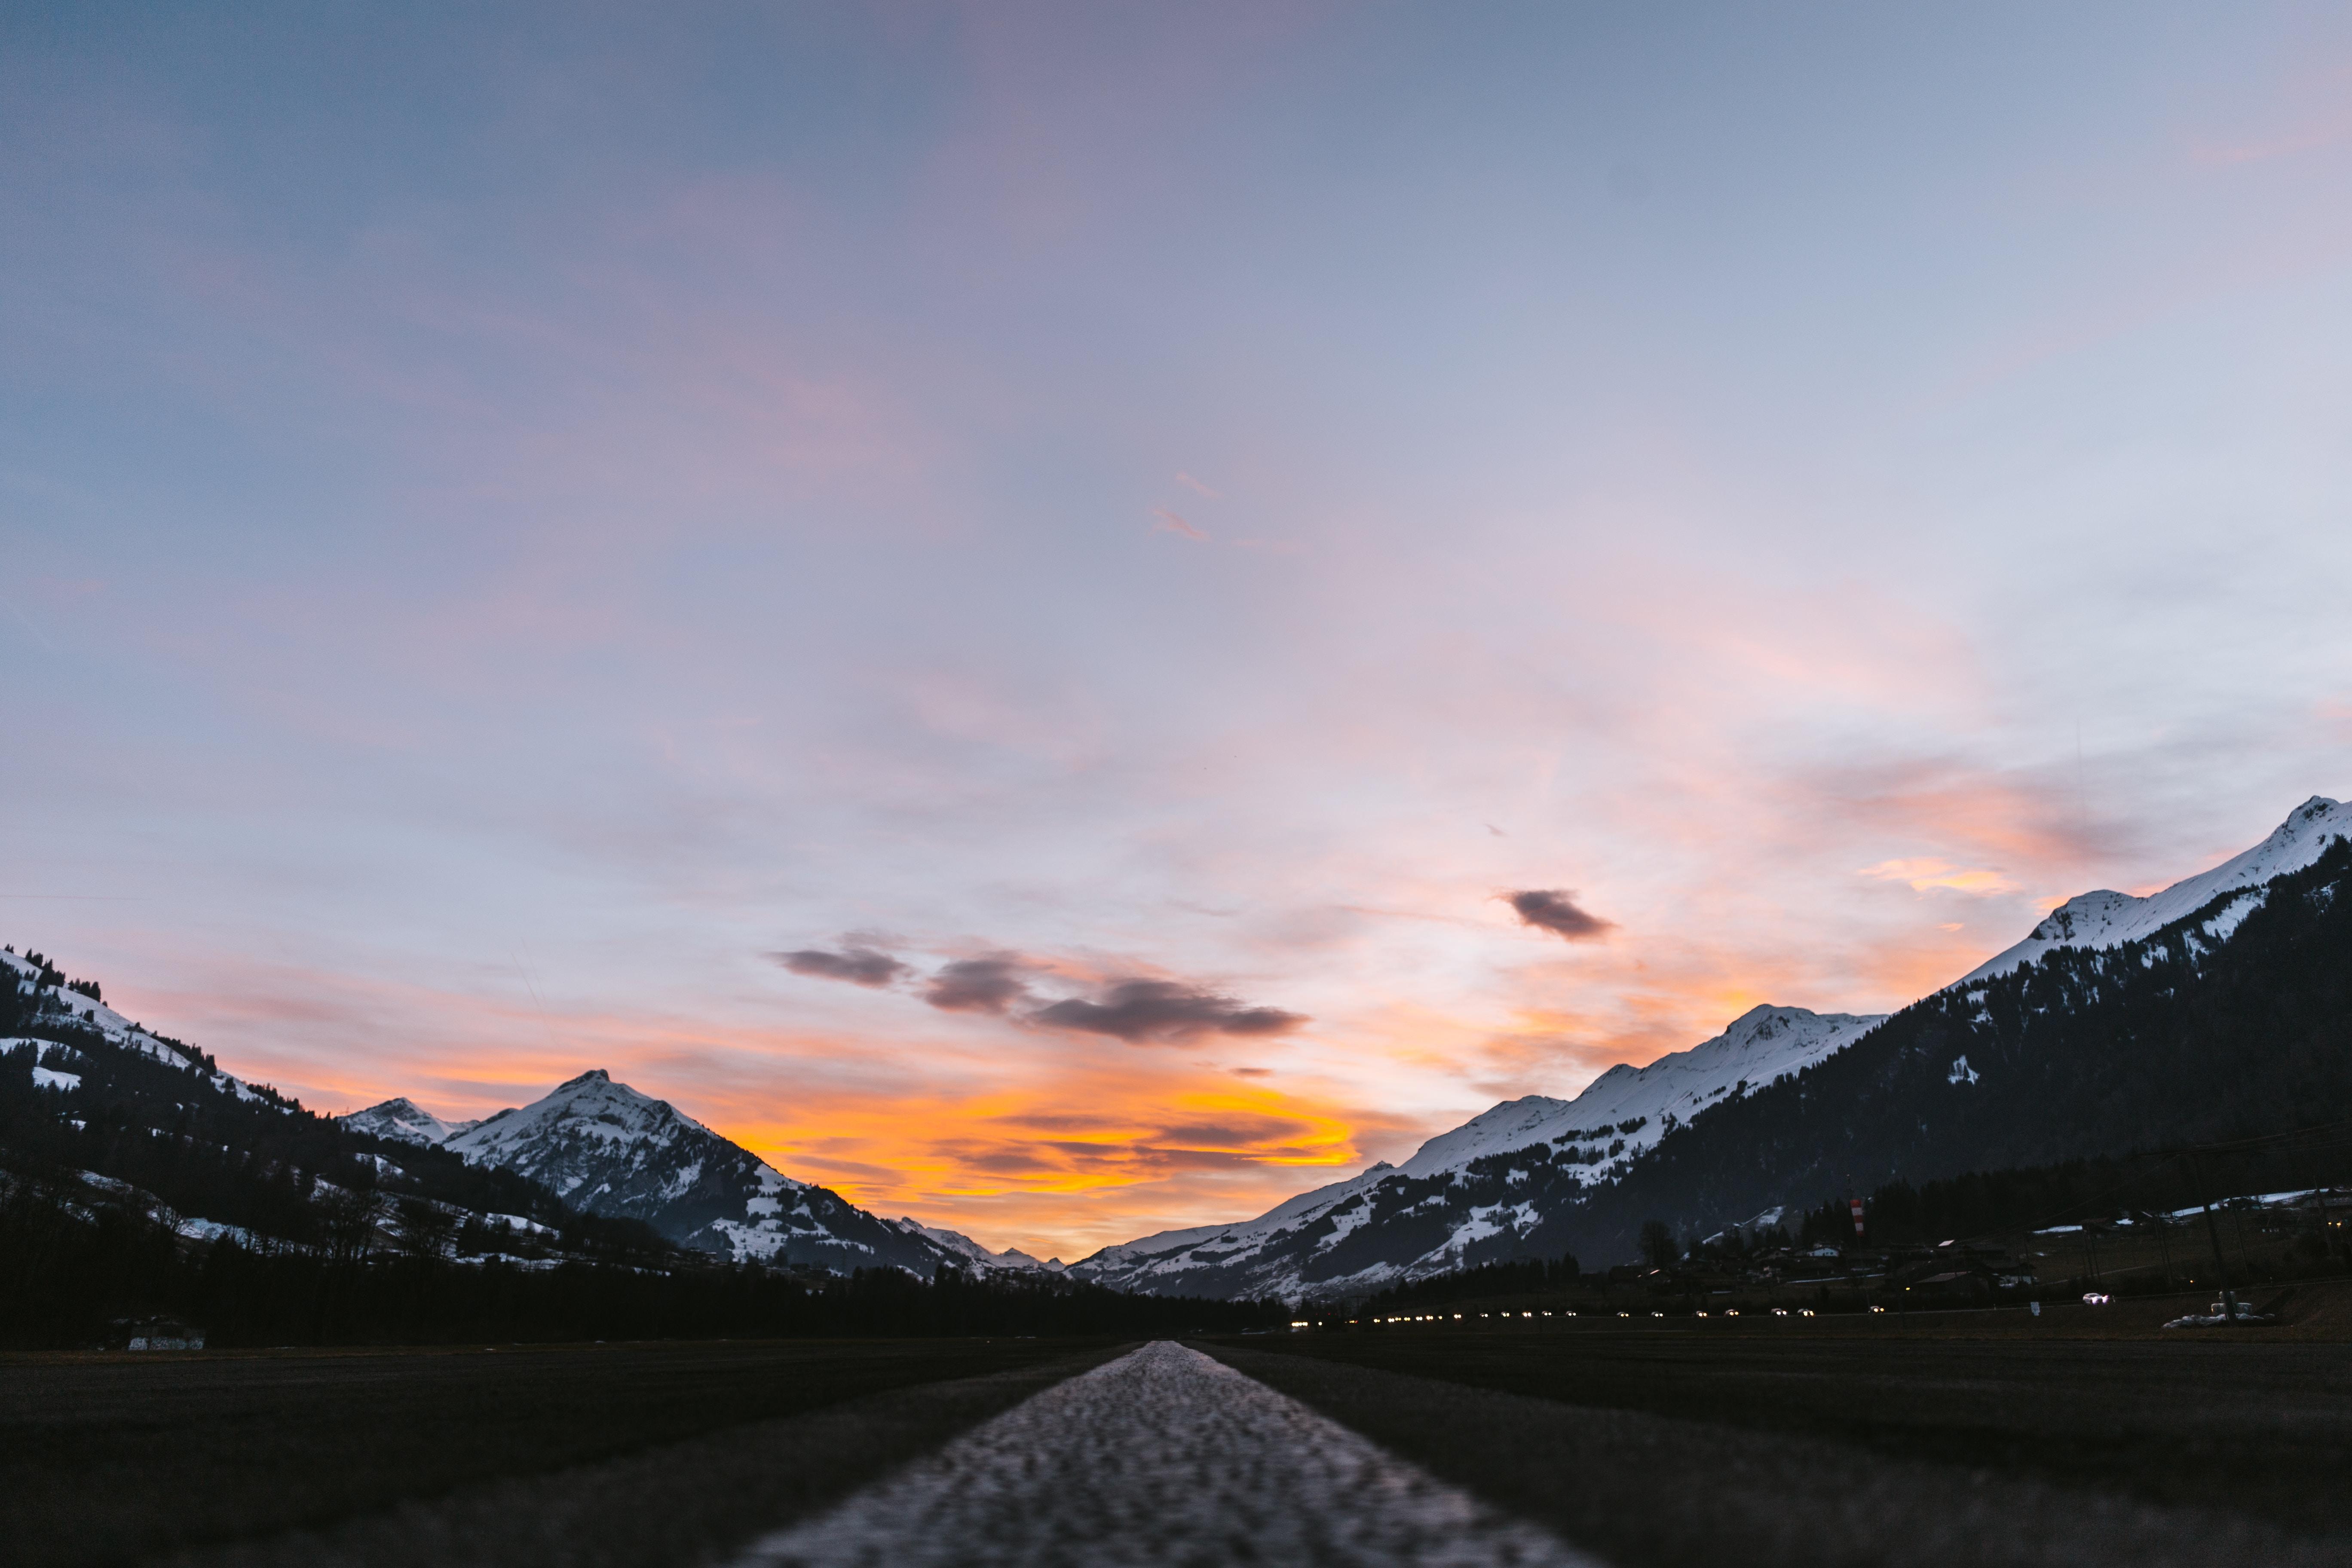 A low shot of an asphalt road running through a mountain valley in Adelboden